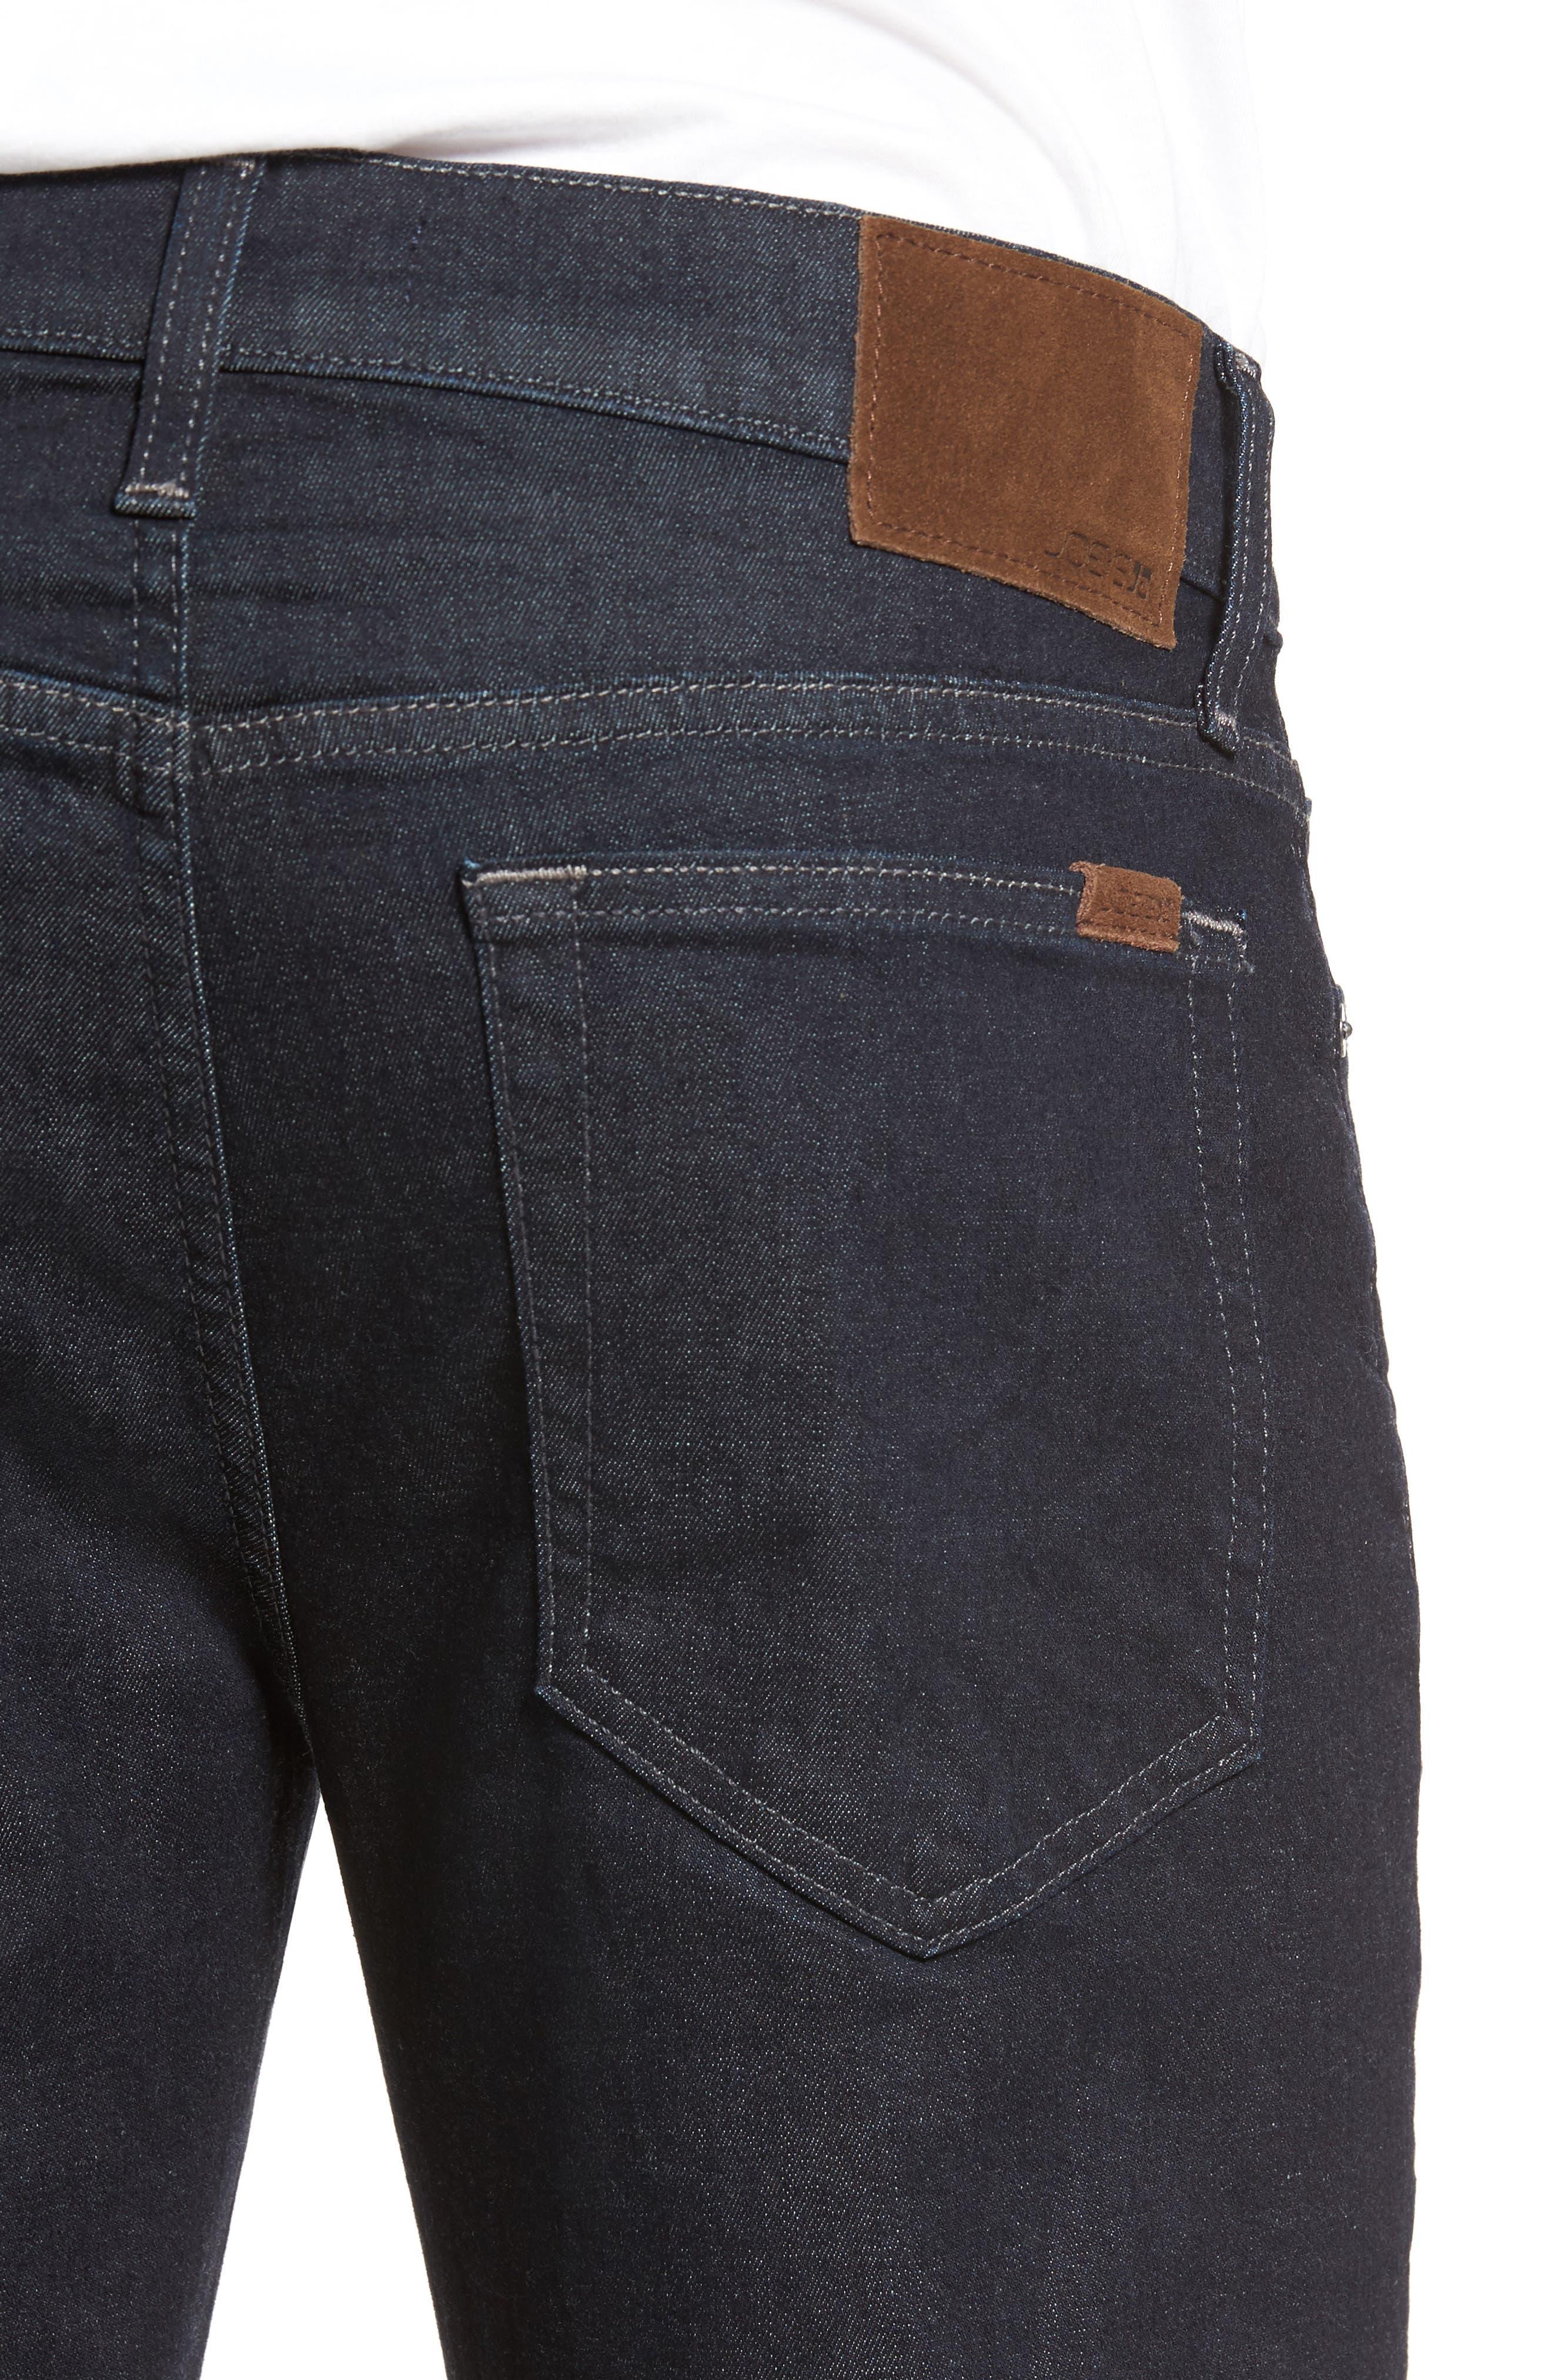 Alternate Image 4  - Joe's Slim Slim Fit Jeans (Nuhollis)